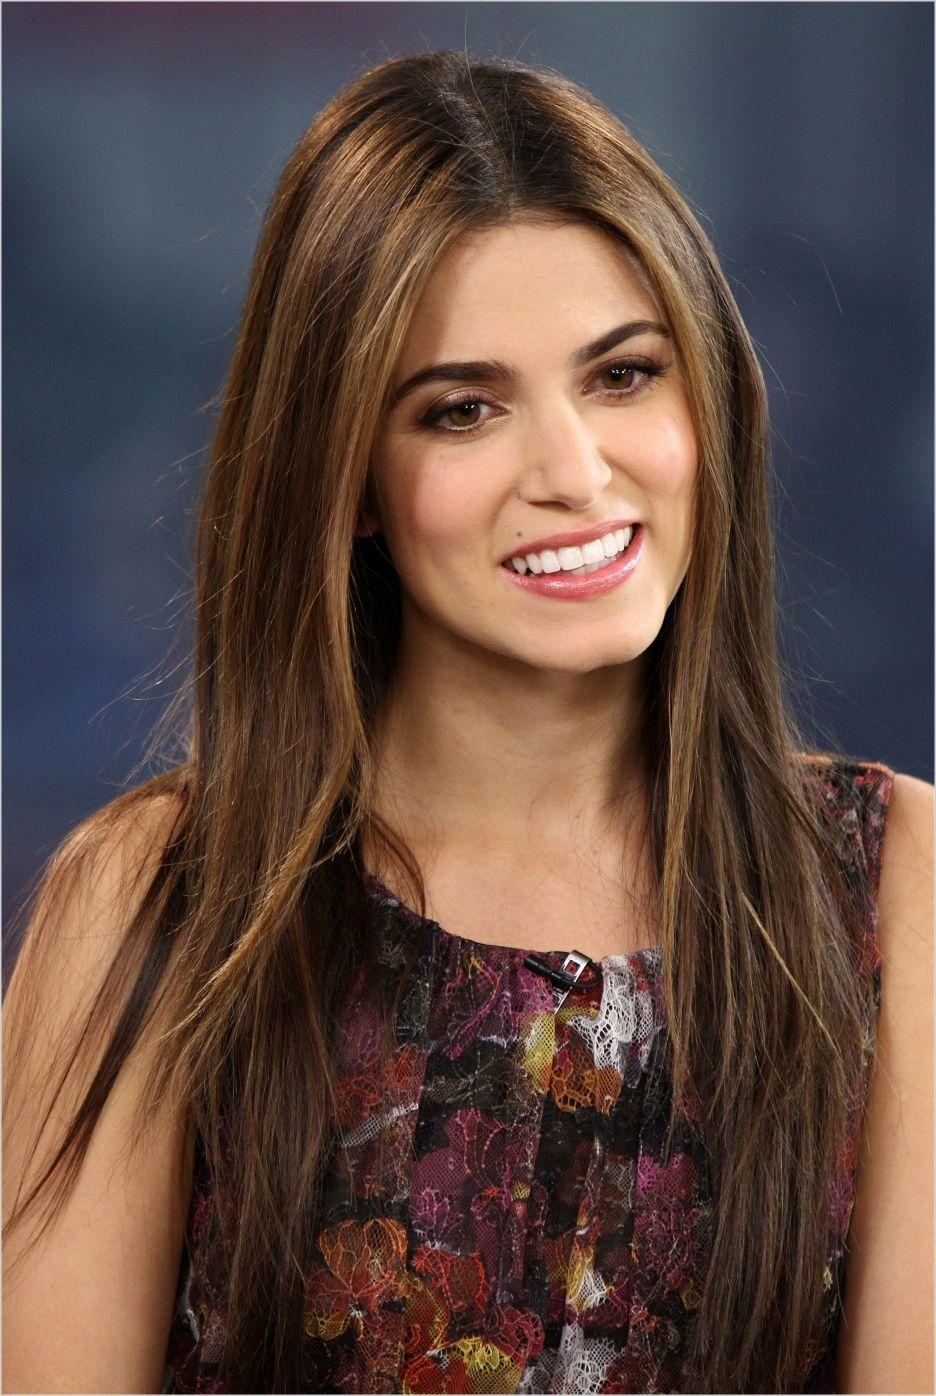 Nikki Reed Rosalie Cullen In Twilight Hair Styles